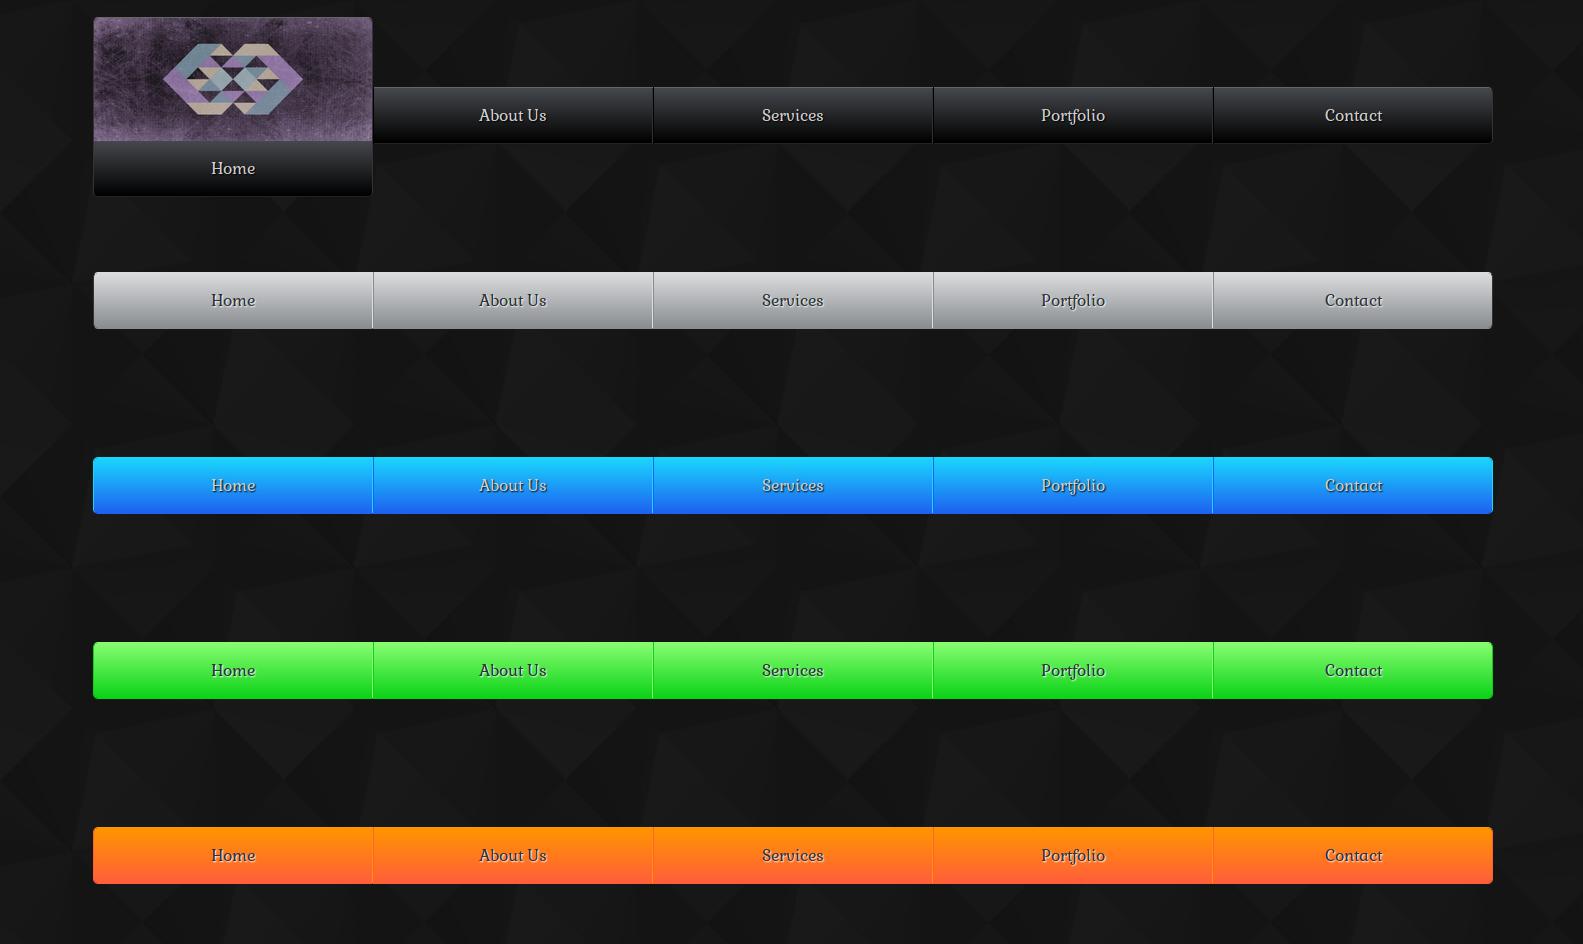 Free Animated Responsive CSS3 HTML5 Image Slide Up Menu Template ...